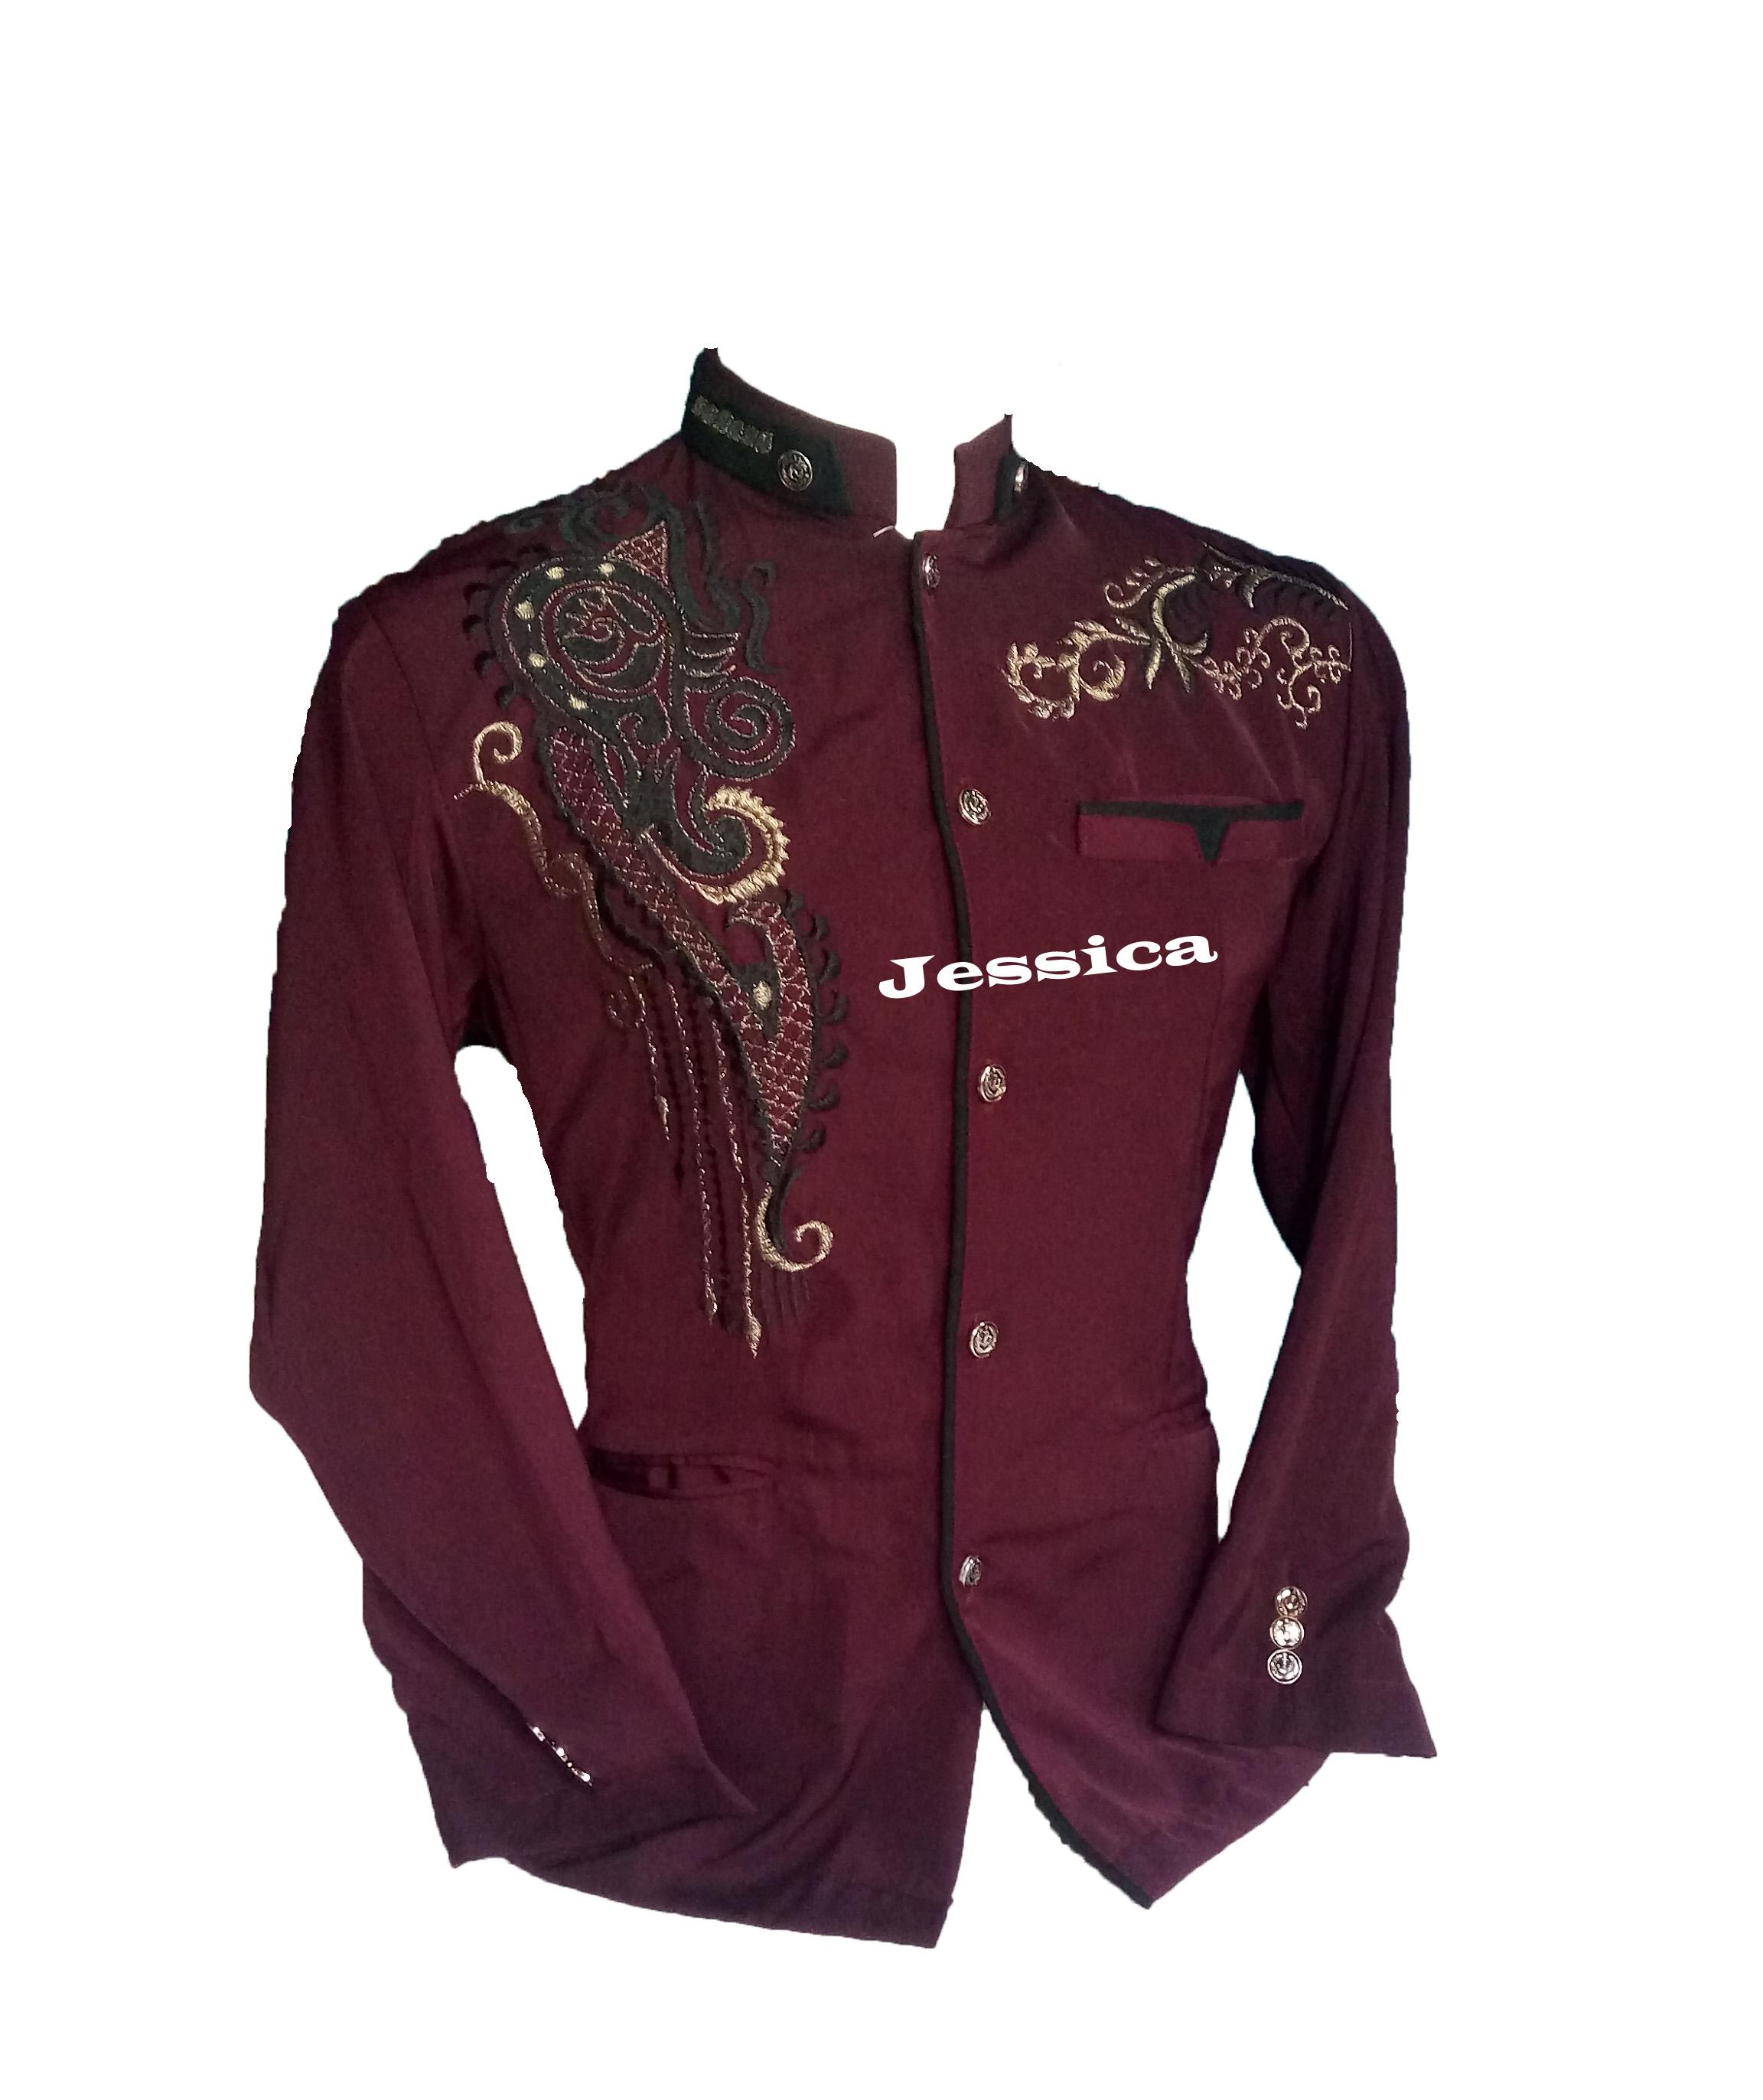 promo jasko /jasko pria/busana muslim pria/atasan muslim pria/baju koko/jasko  marun lis hitam motif jsc